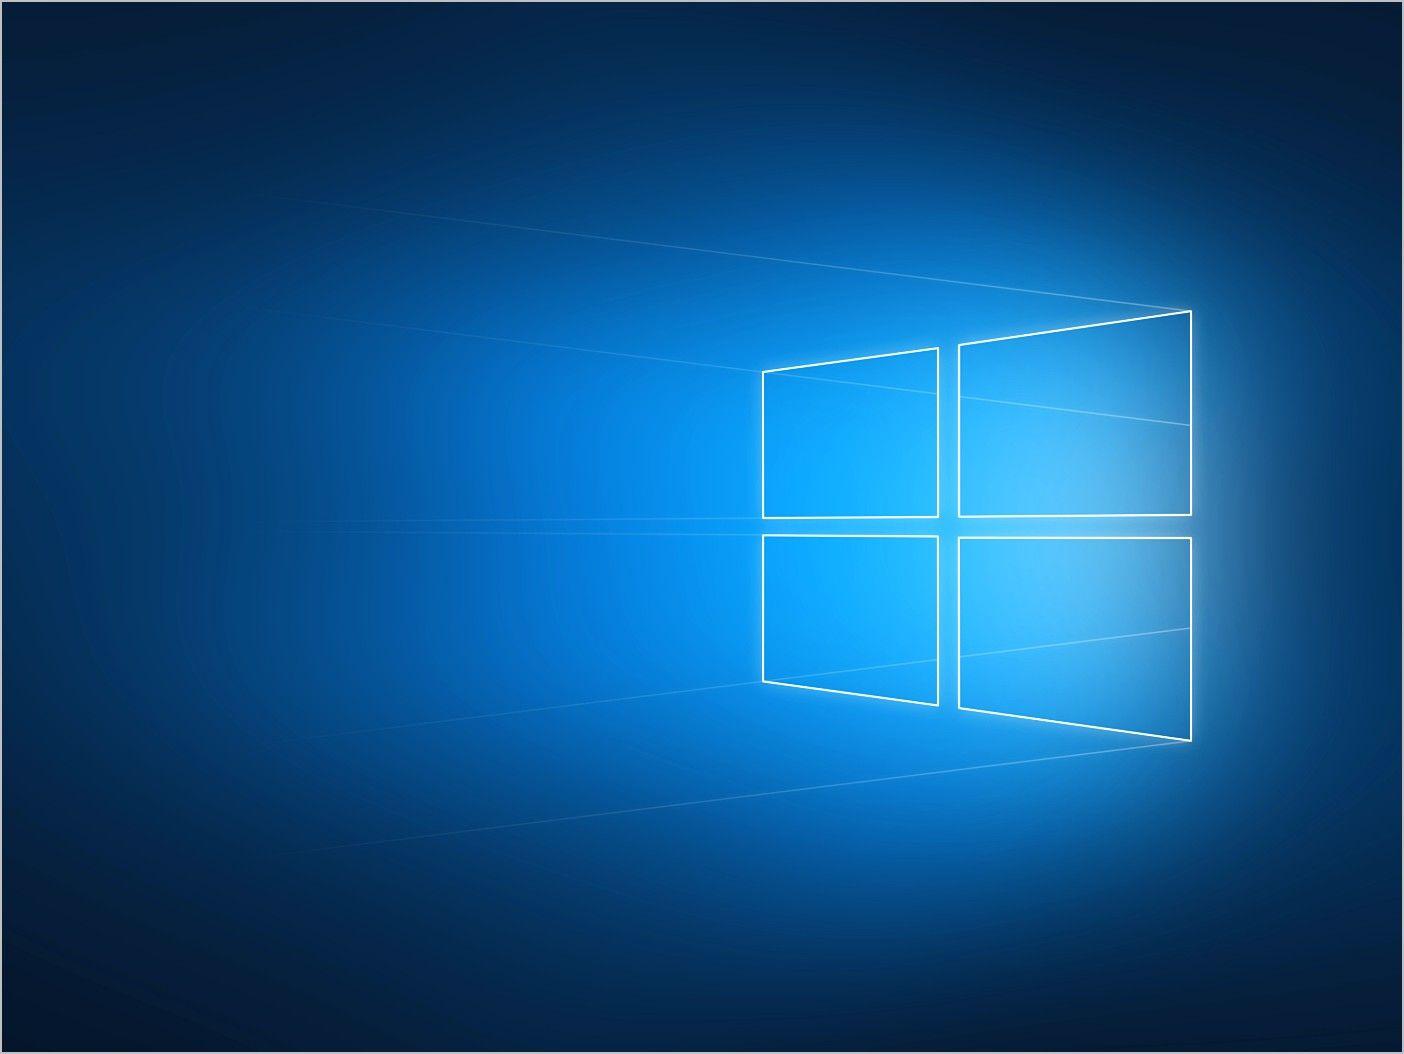 4k Windows 10 Hero Wallpaper Hero Wallpaper Wallpaper Windows 10